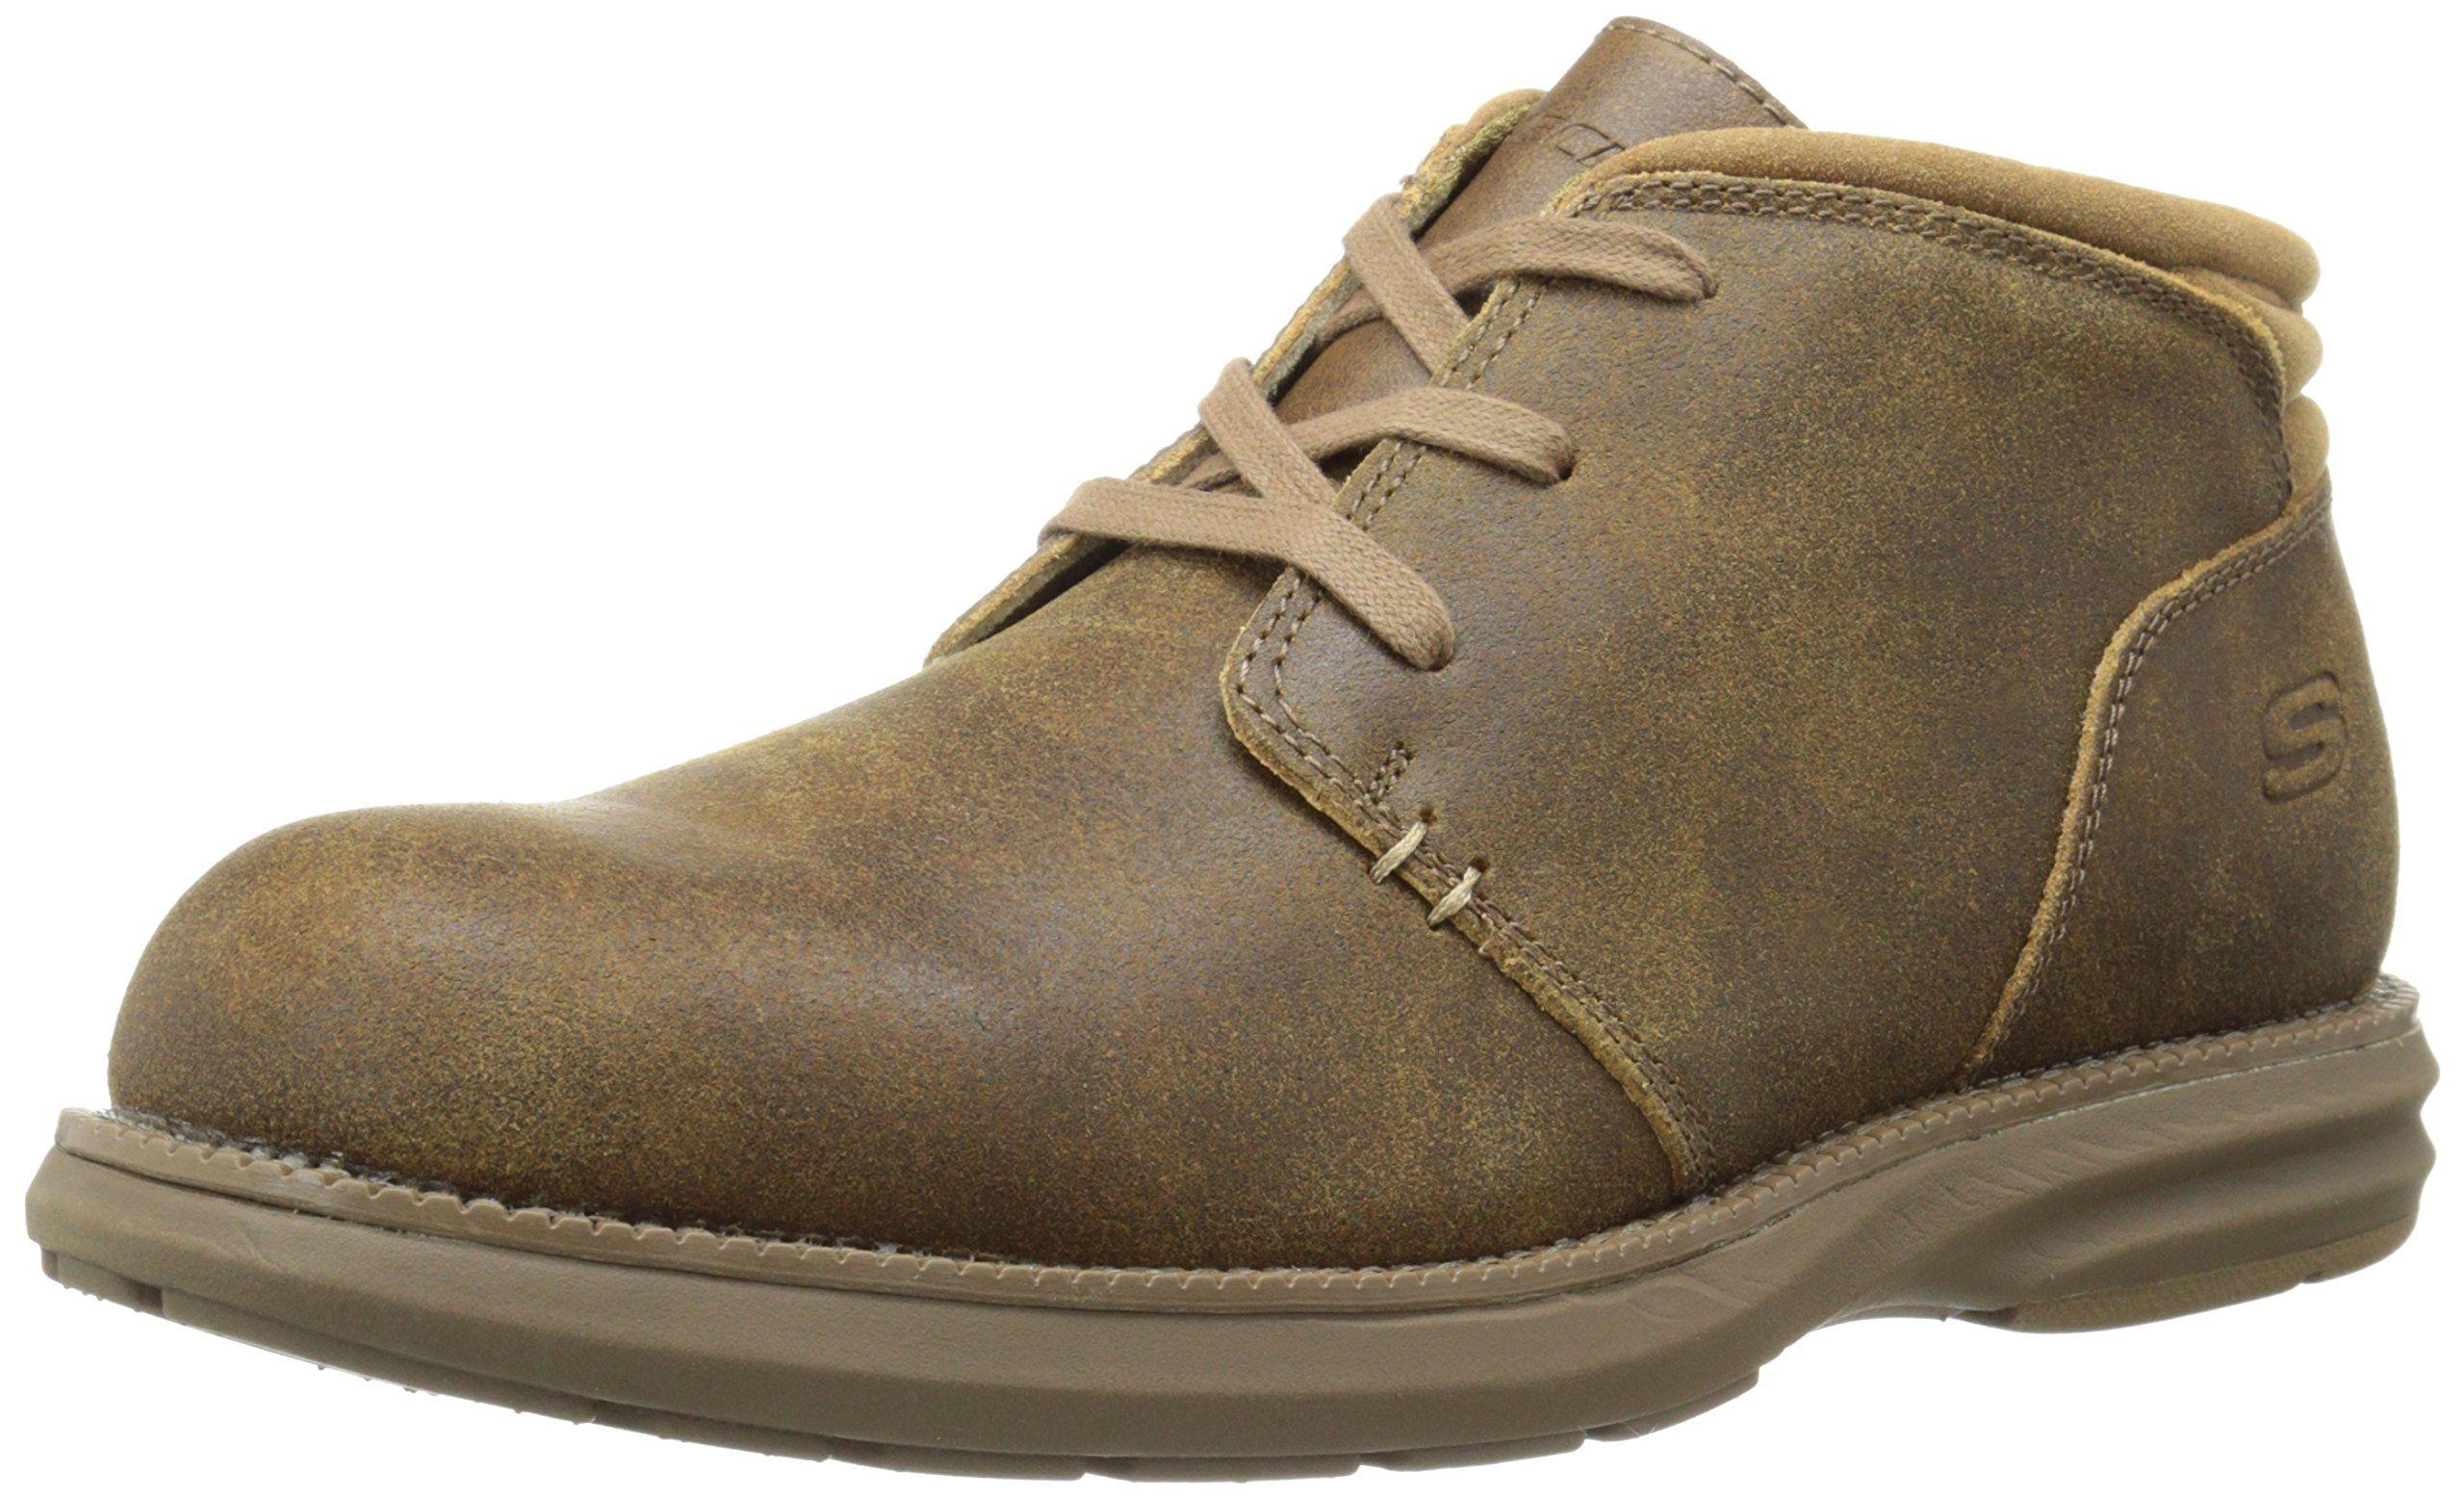 Skechers Usa Men S Volte Herick Chukka Boot Honey 11 M Us With Images Chukka Boots Women Boots Boots Men